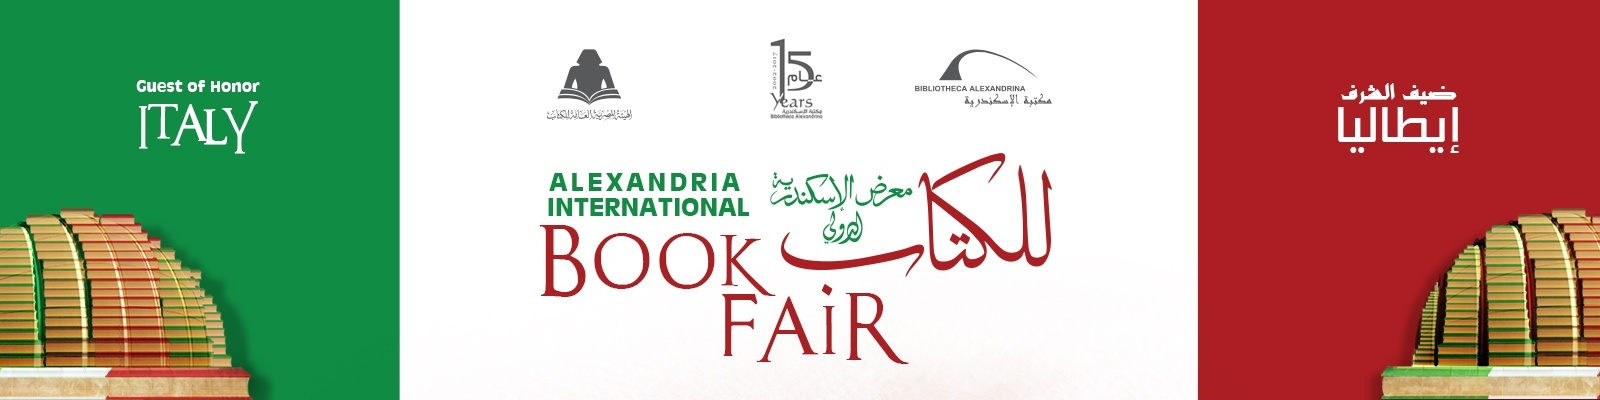 Alexandria International Book Fair